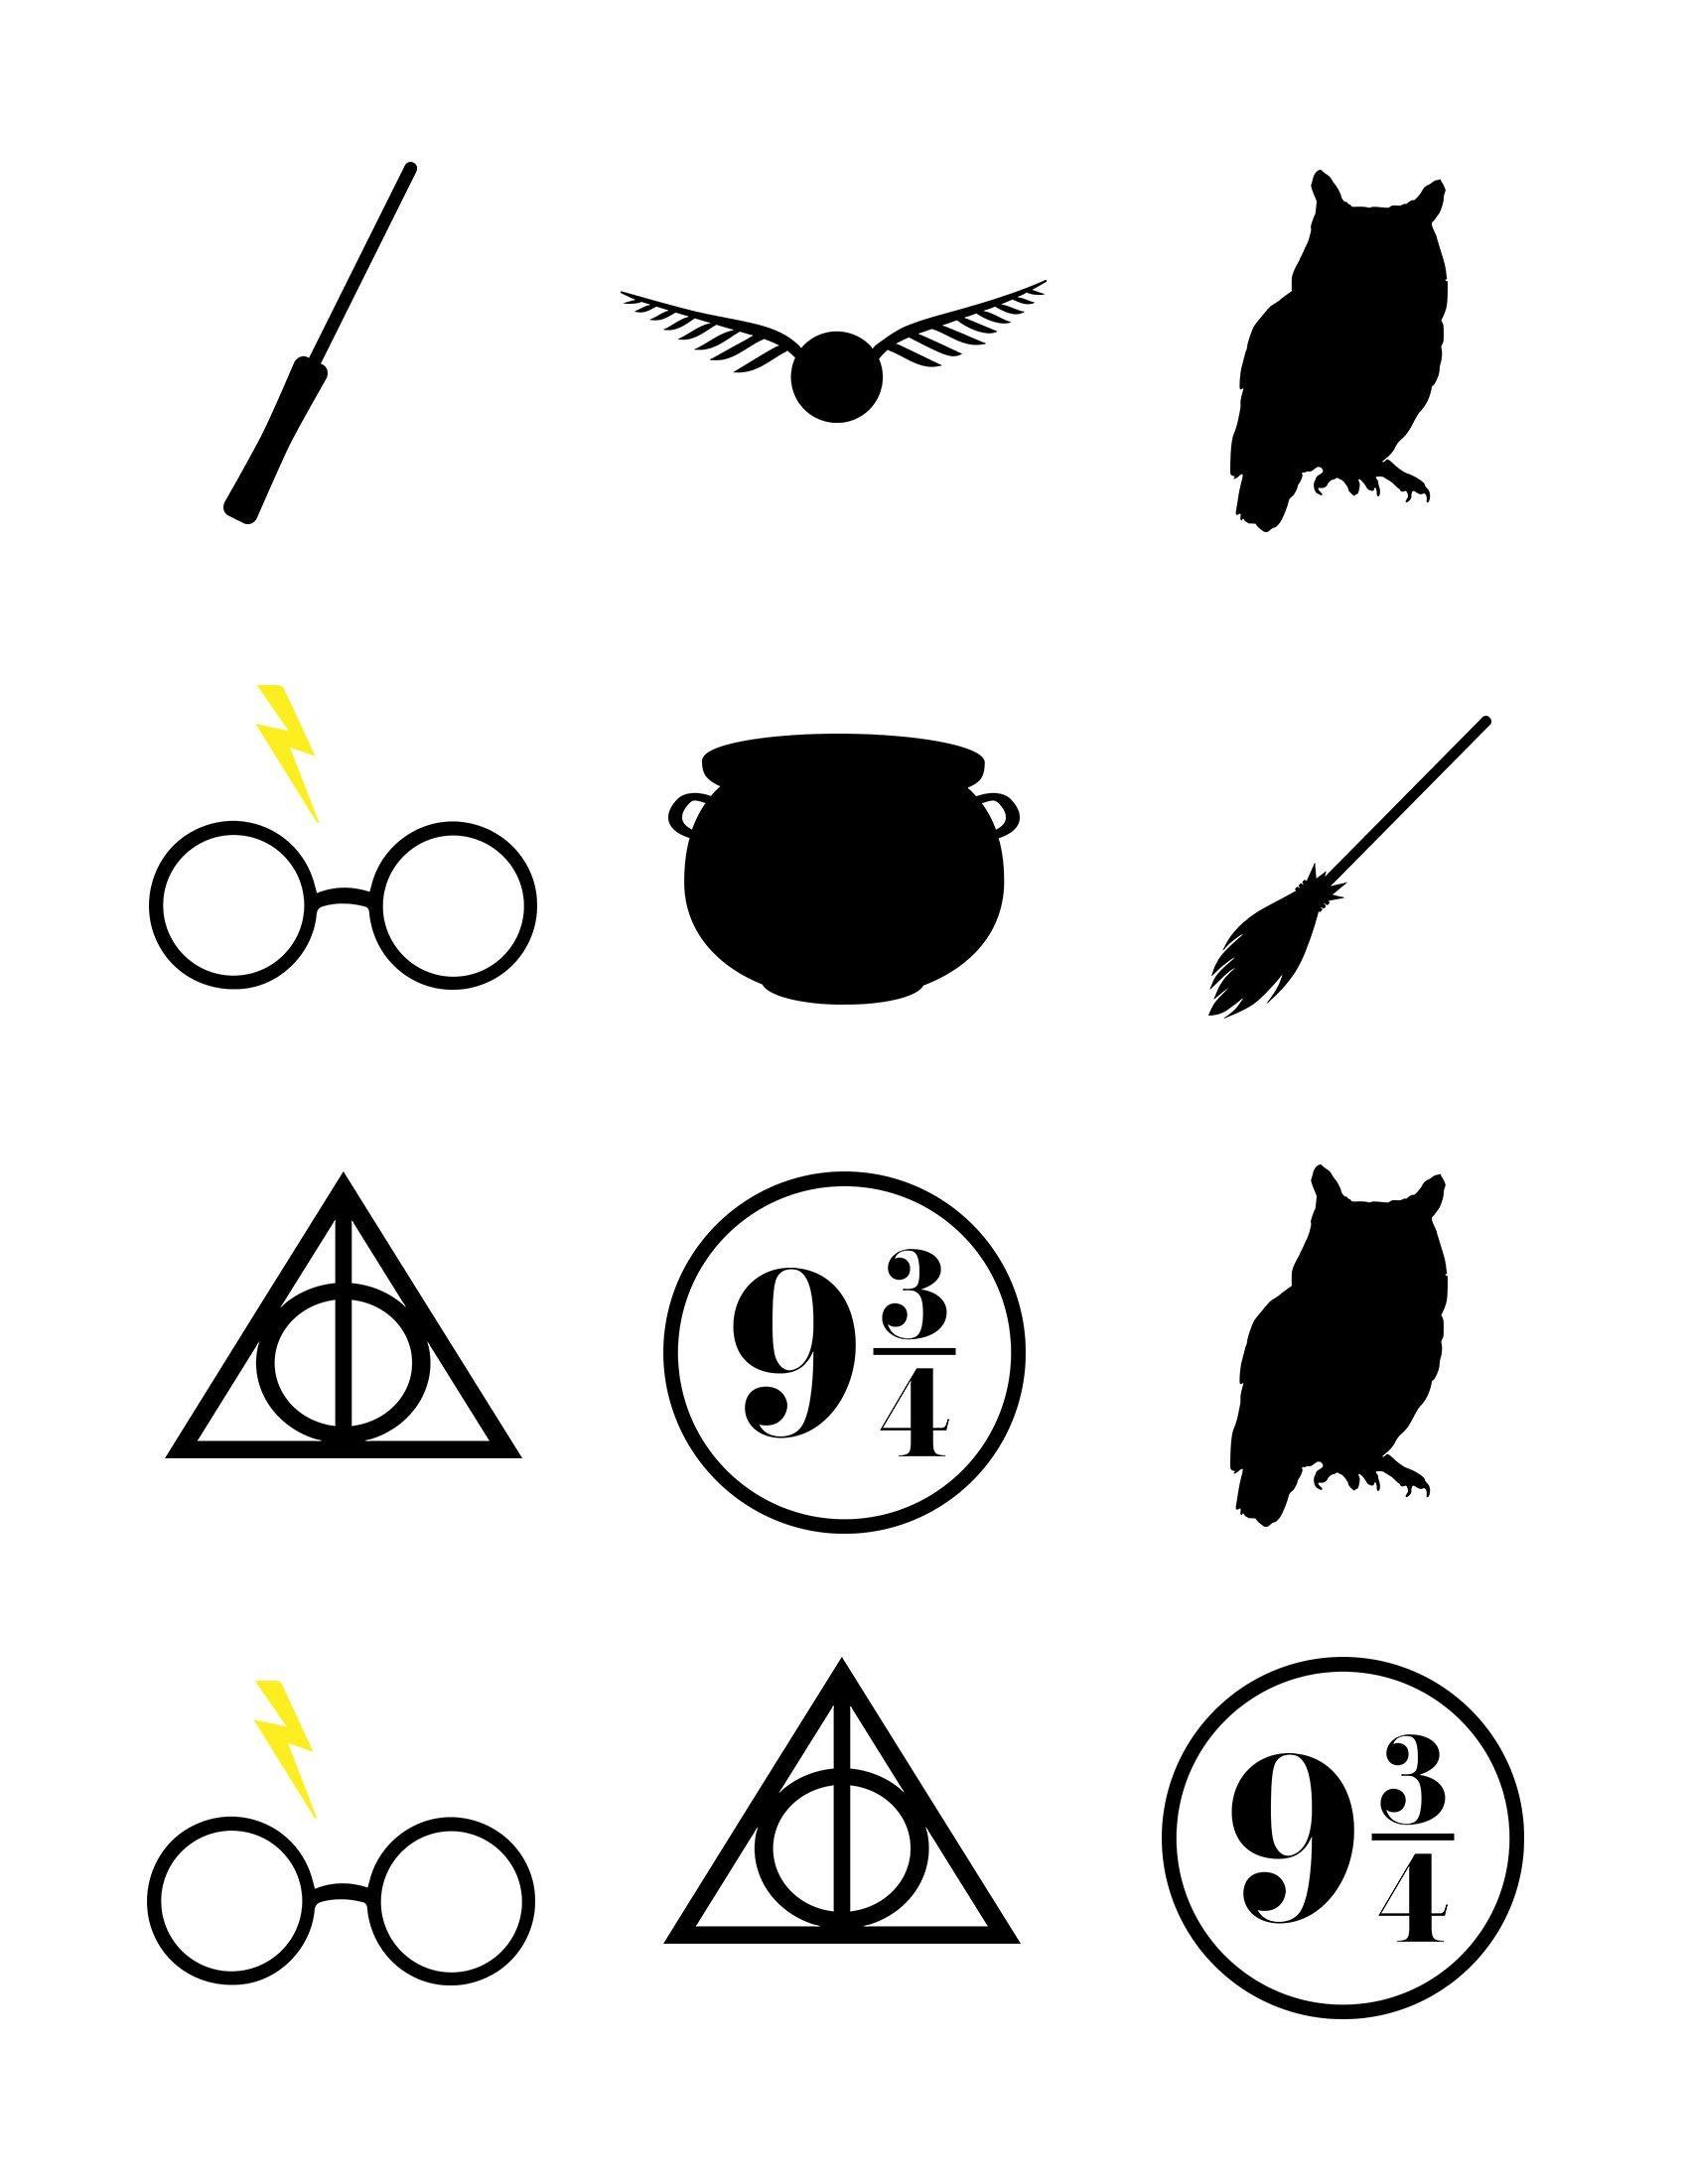 Harry Potter Baby Shower   Harry Potter Stuff   Harry Potter Baby - Free Printable Harry Potter Clip Art